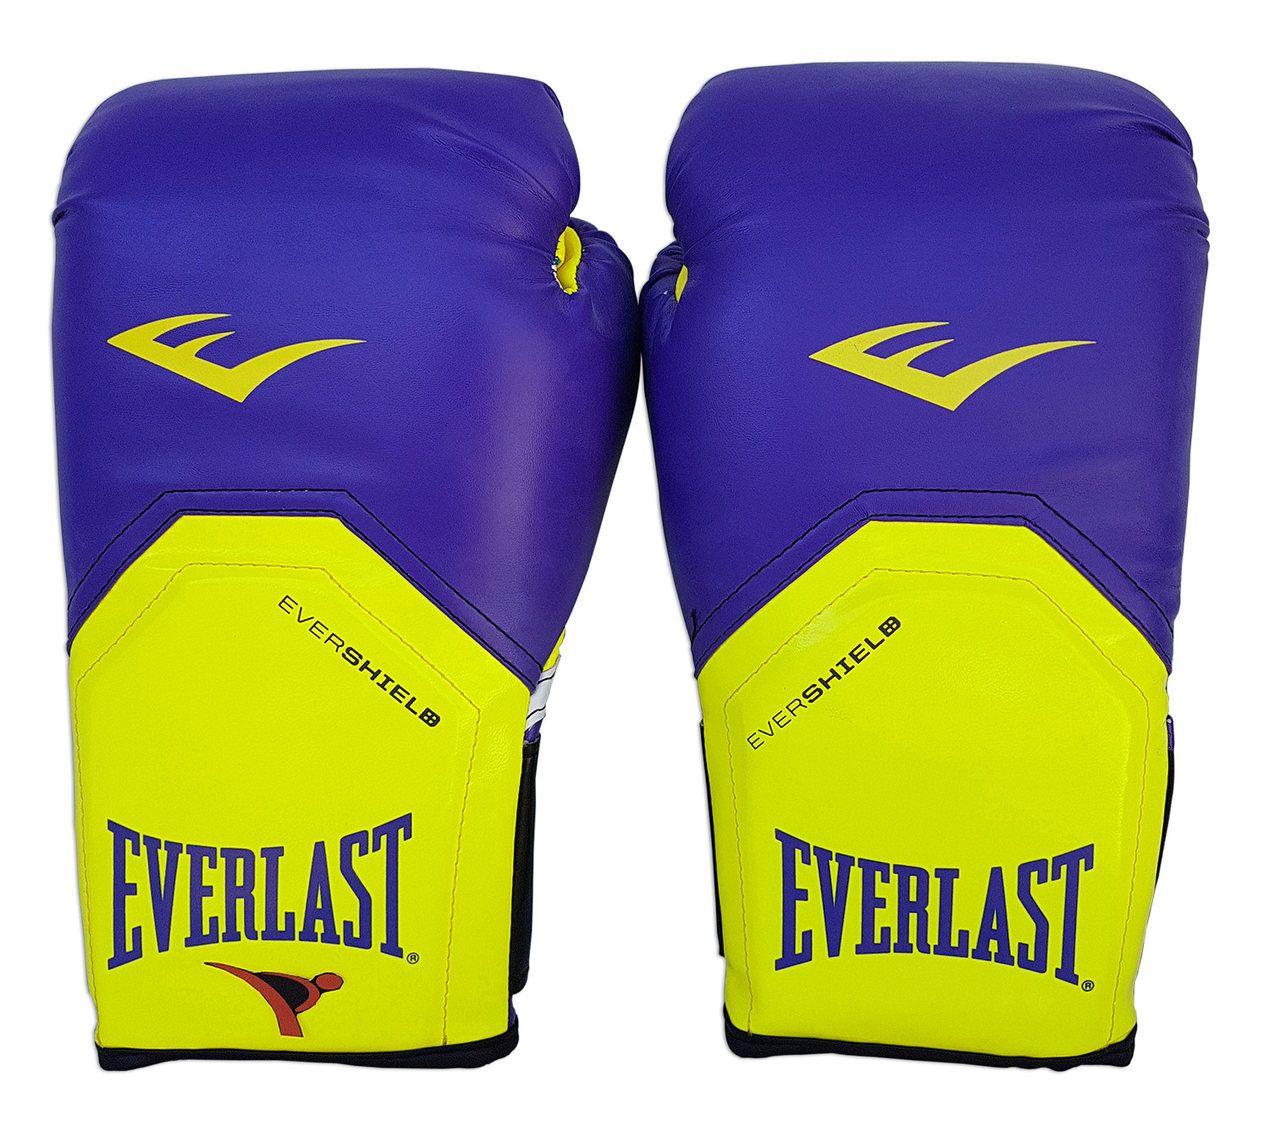 Kit de Boxe / Muay Thai Feminino 12oz - Roxo com Amarelo - Pro Style - Everlast  - PRALUTA SHOP